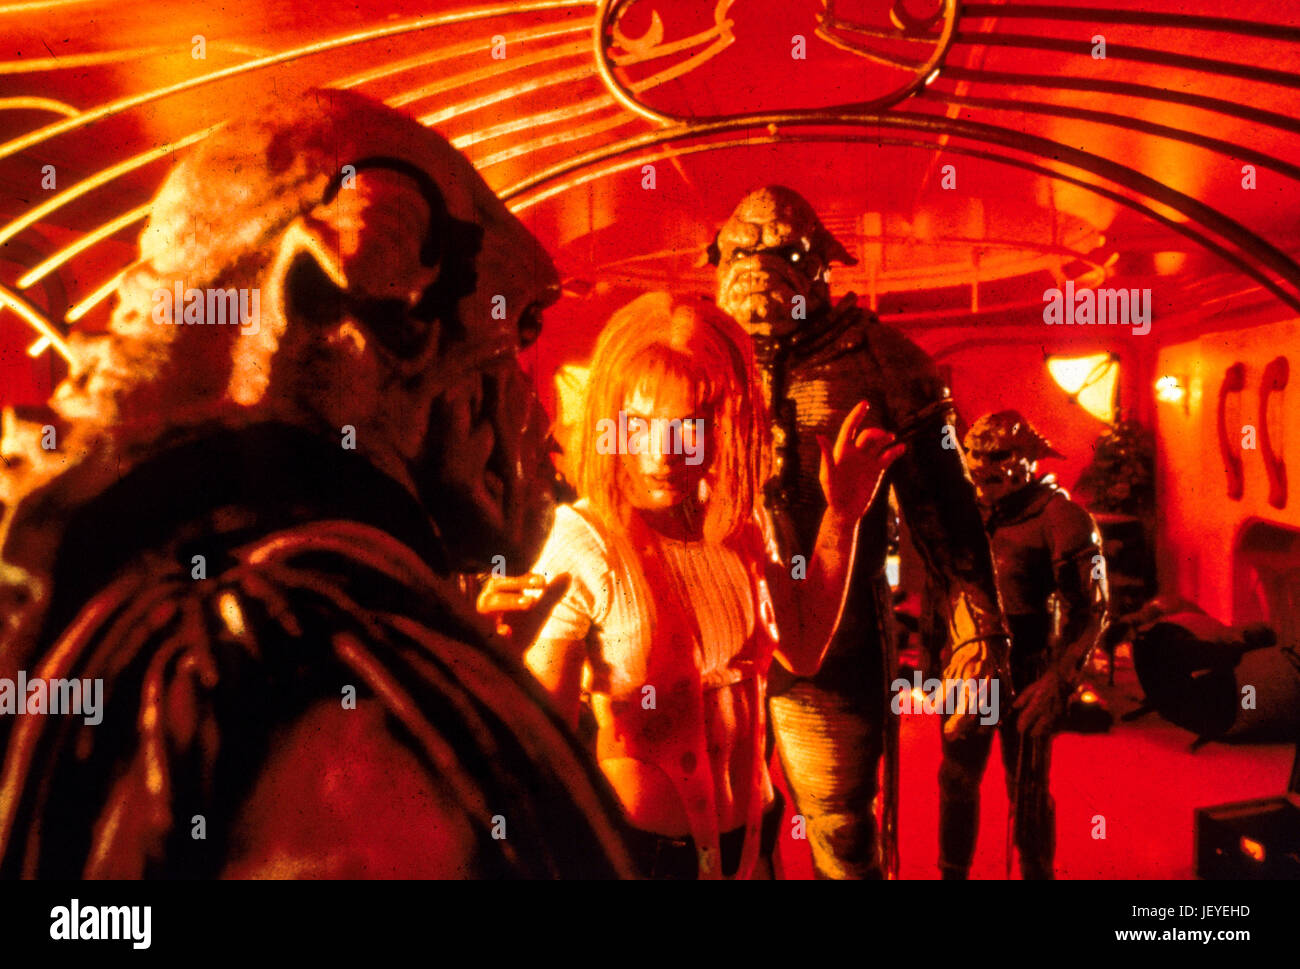 the fifth element, 1997, milla jovovich - Stock Image